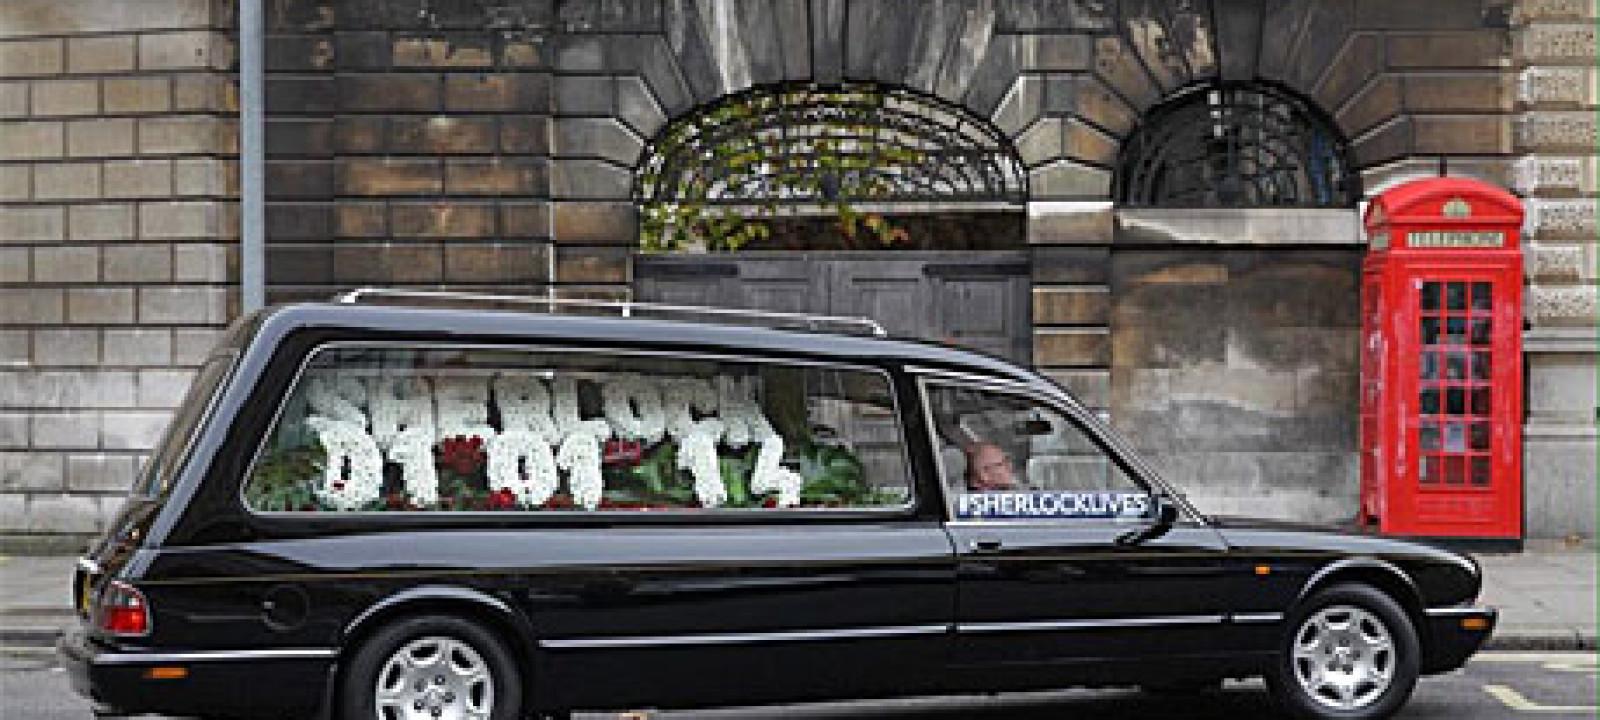 Sherlock's hearse